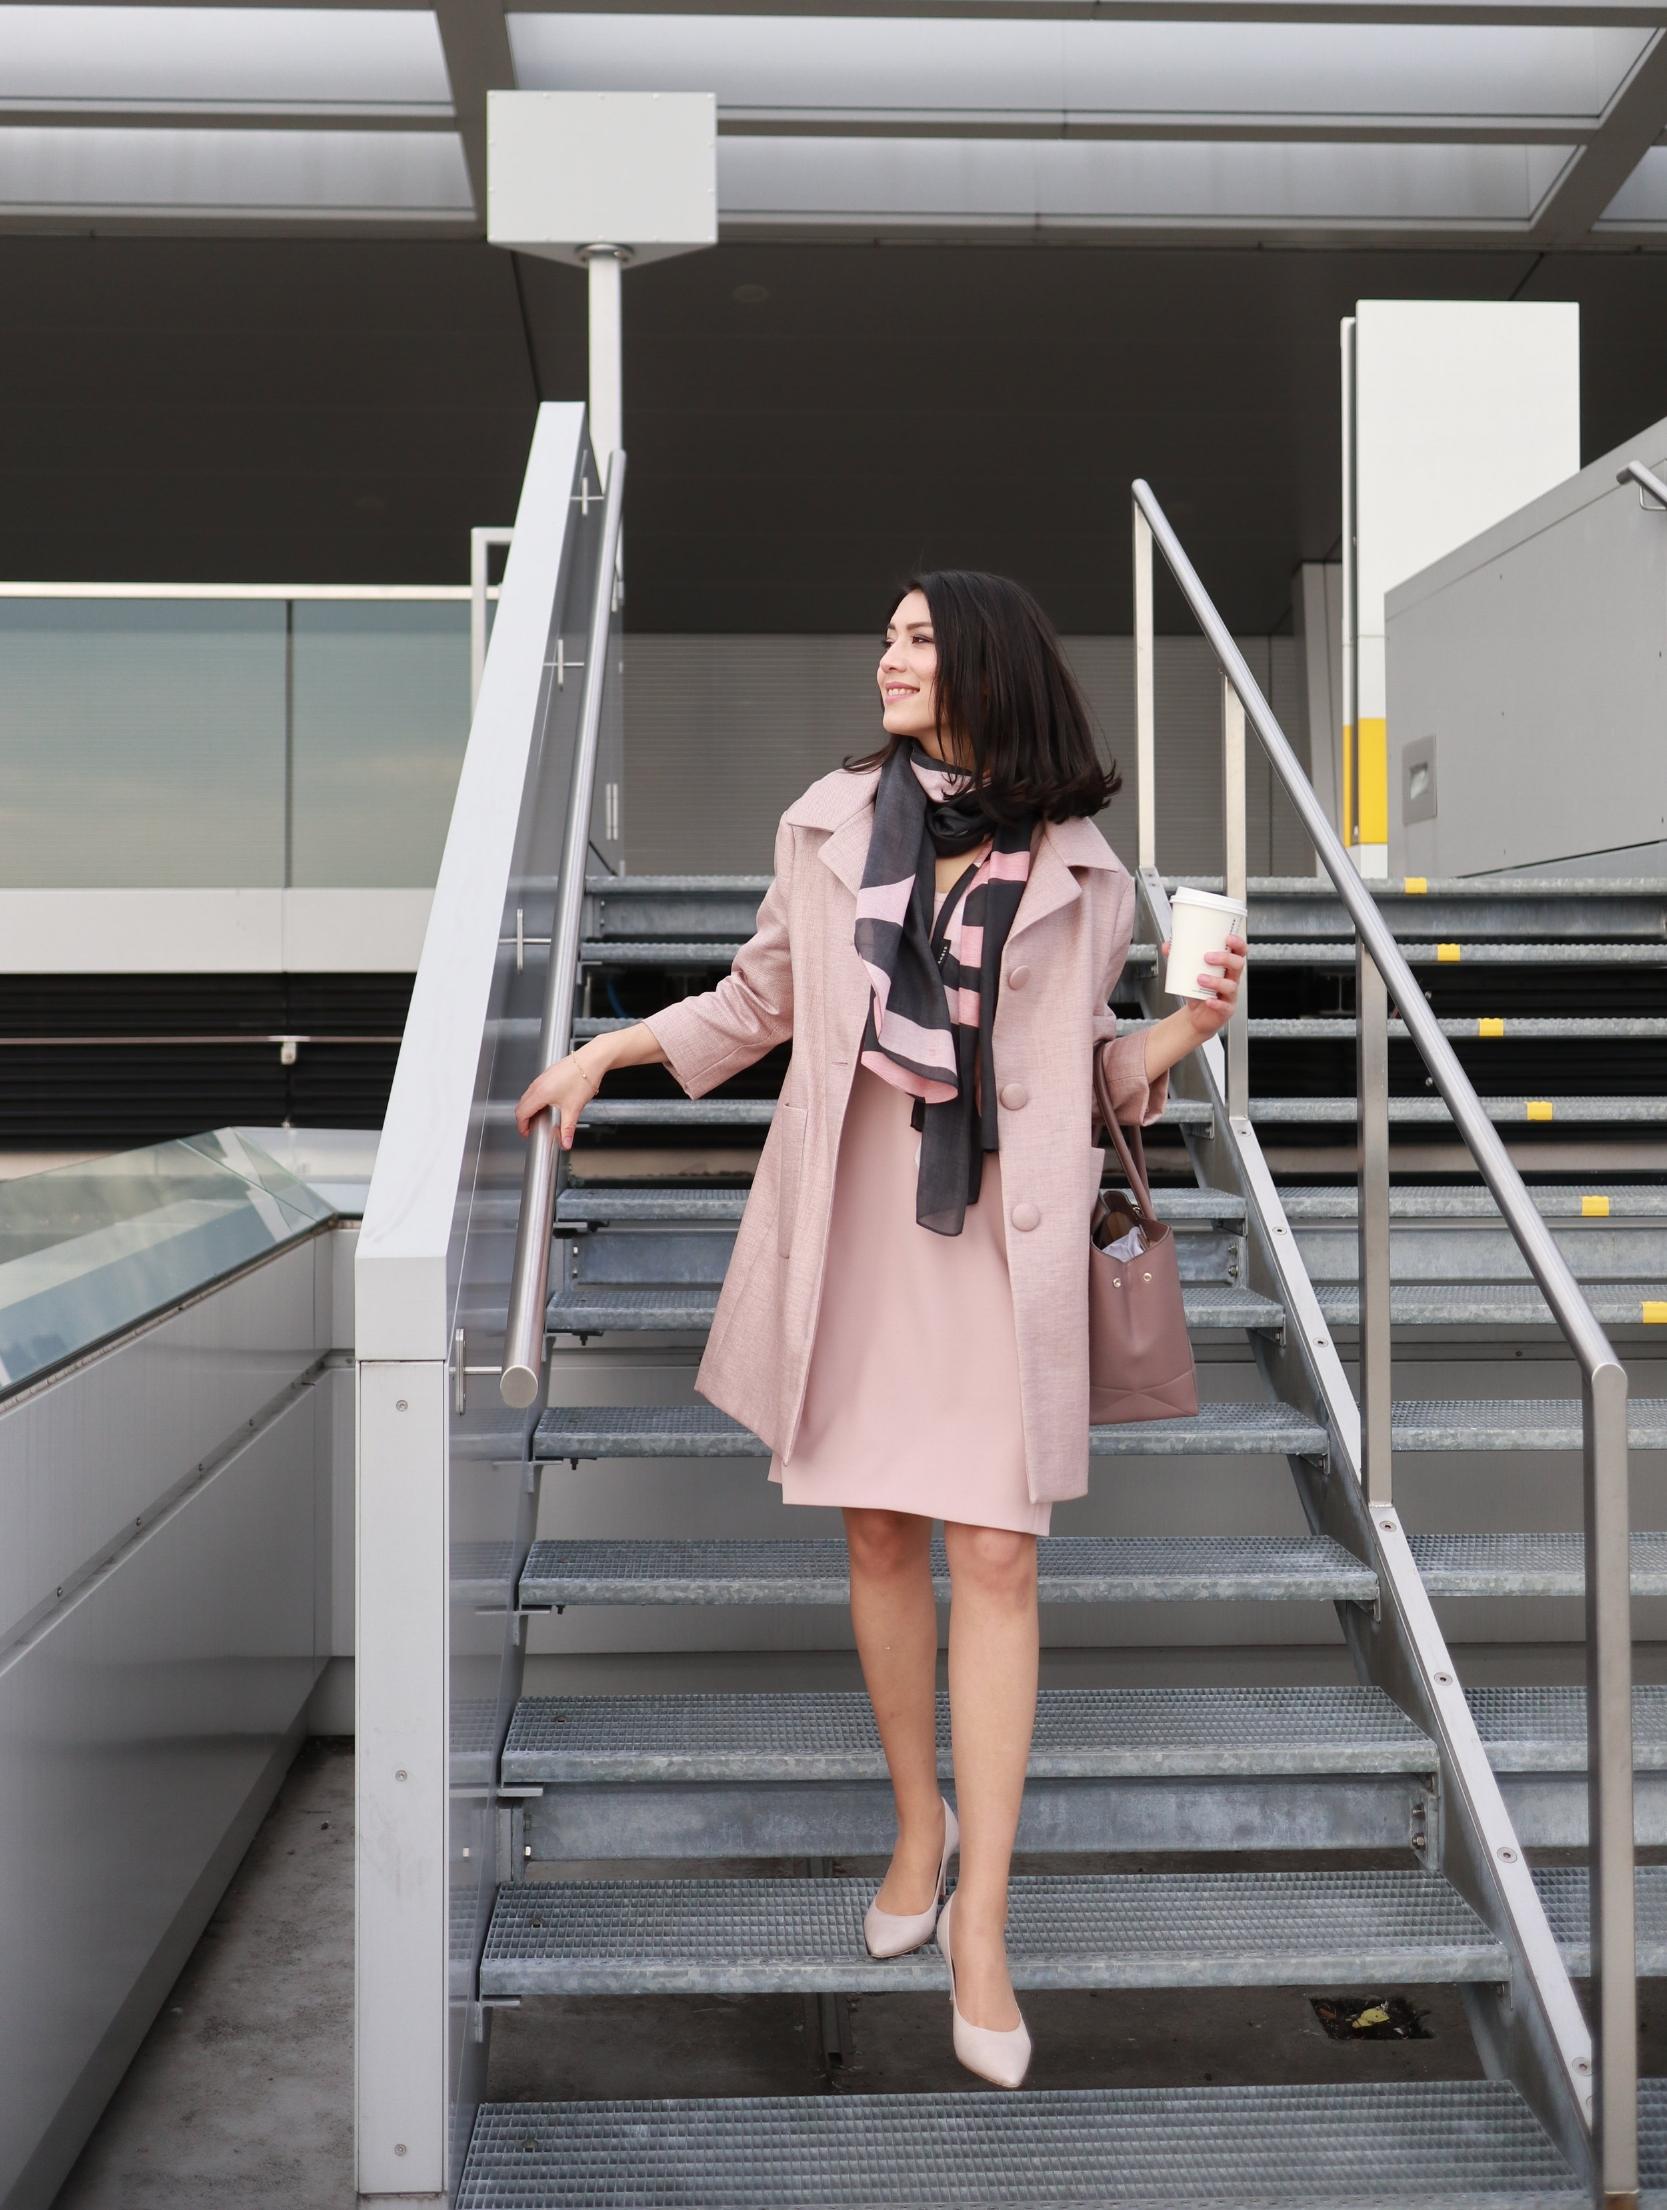 Das perfekte Business Casual Outfit für den Frühling gefunden bei PKZ Women Zürich. (Foto: Moritz Schmid)